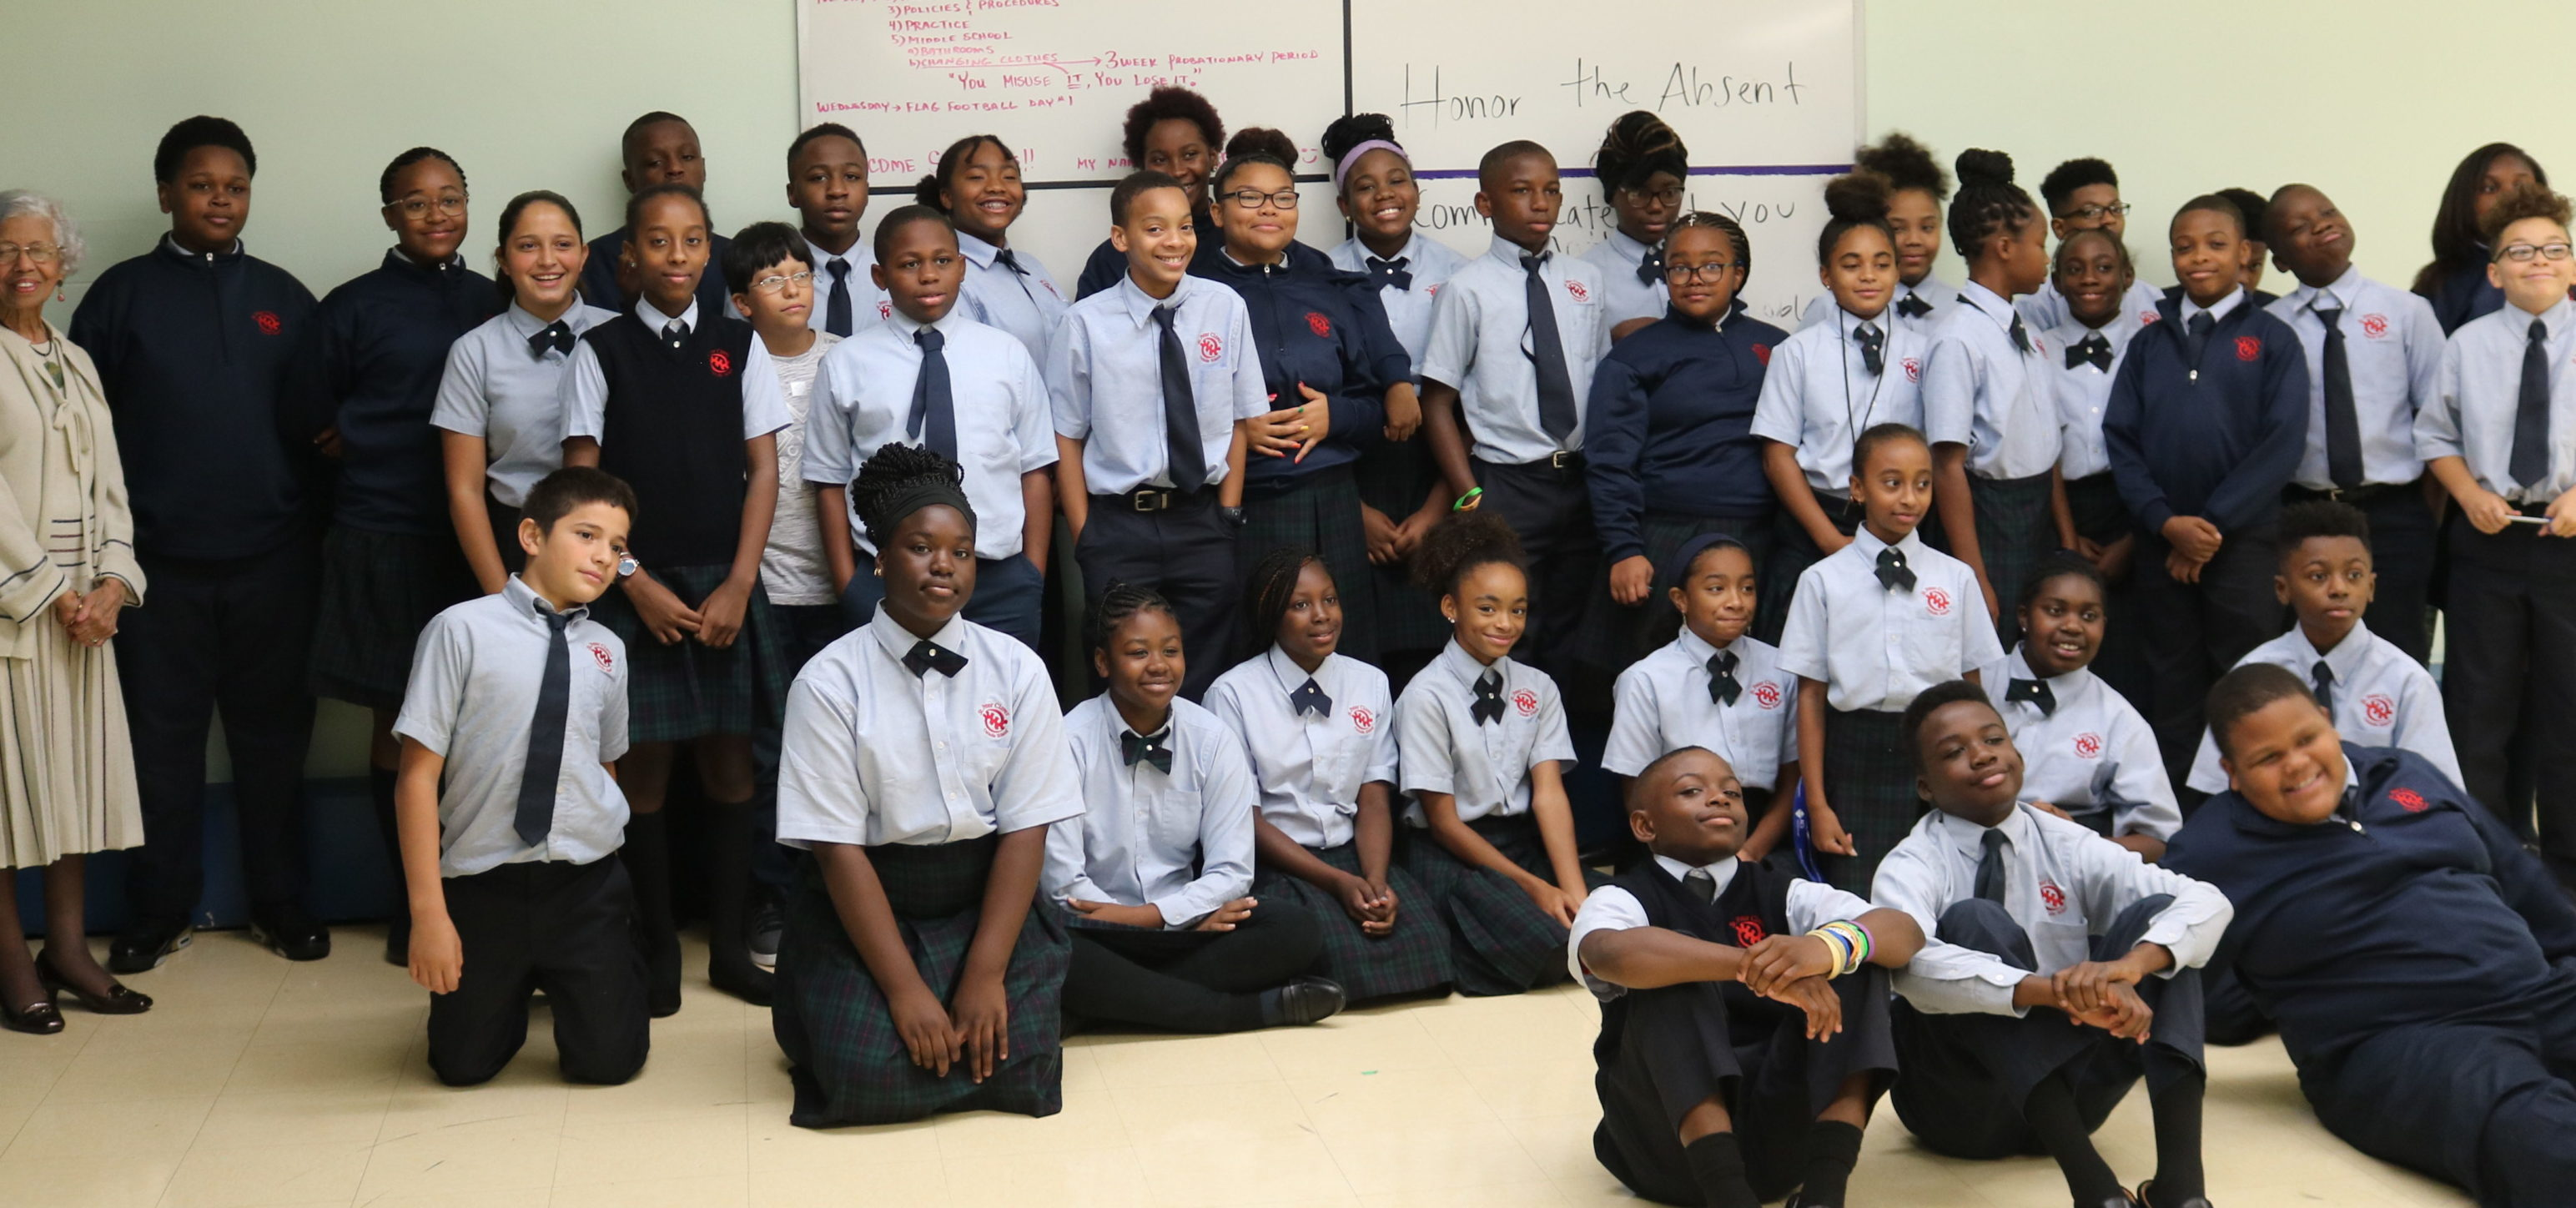 Civil rights pioneer Dr. Josie Johnson visits